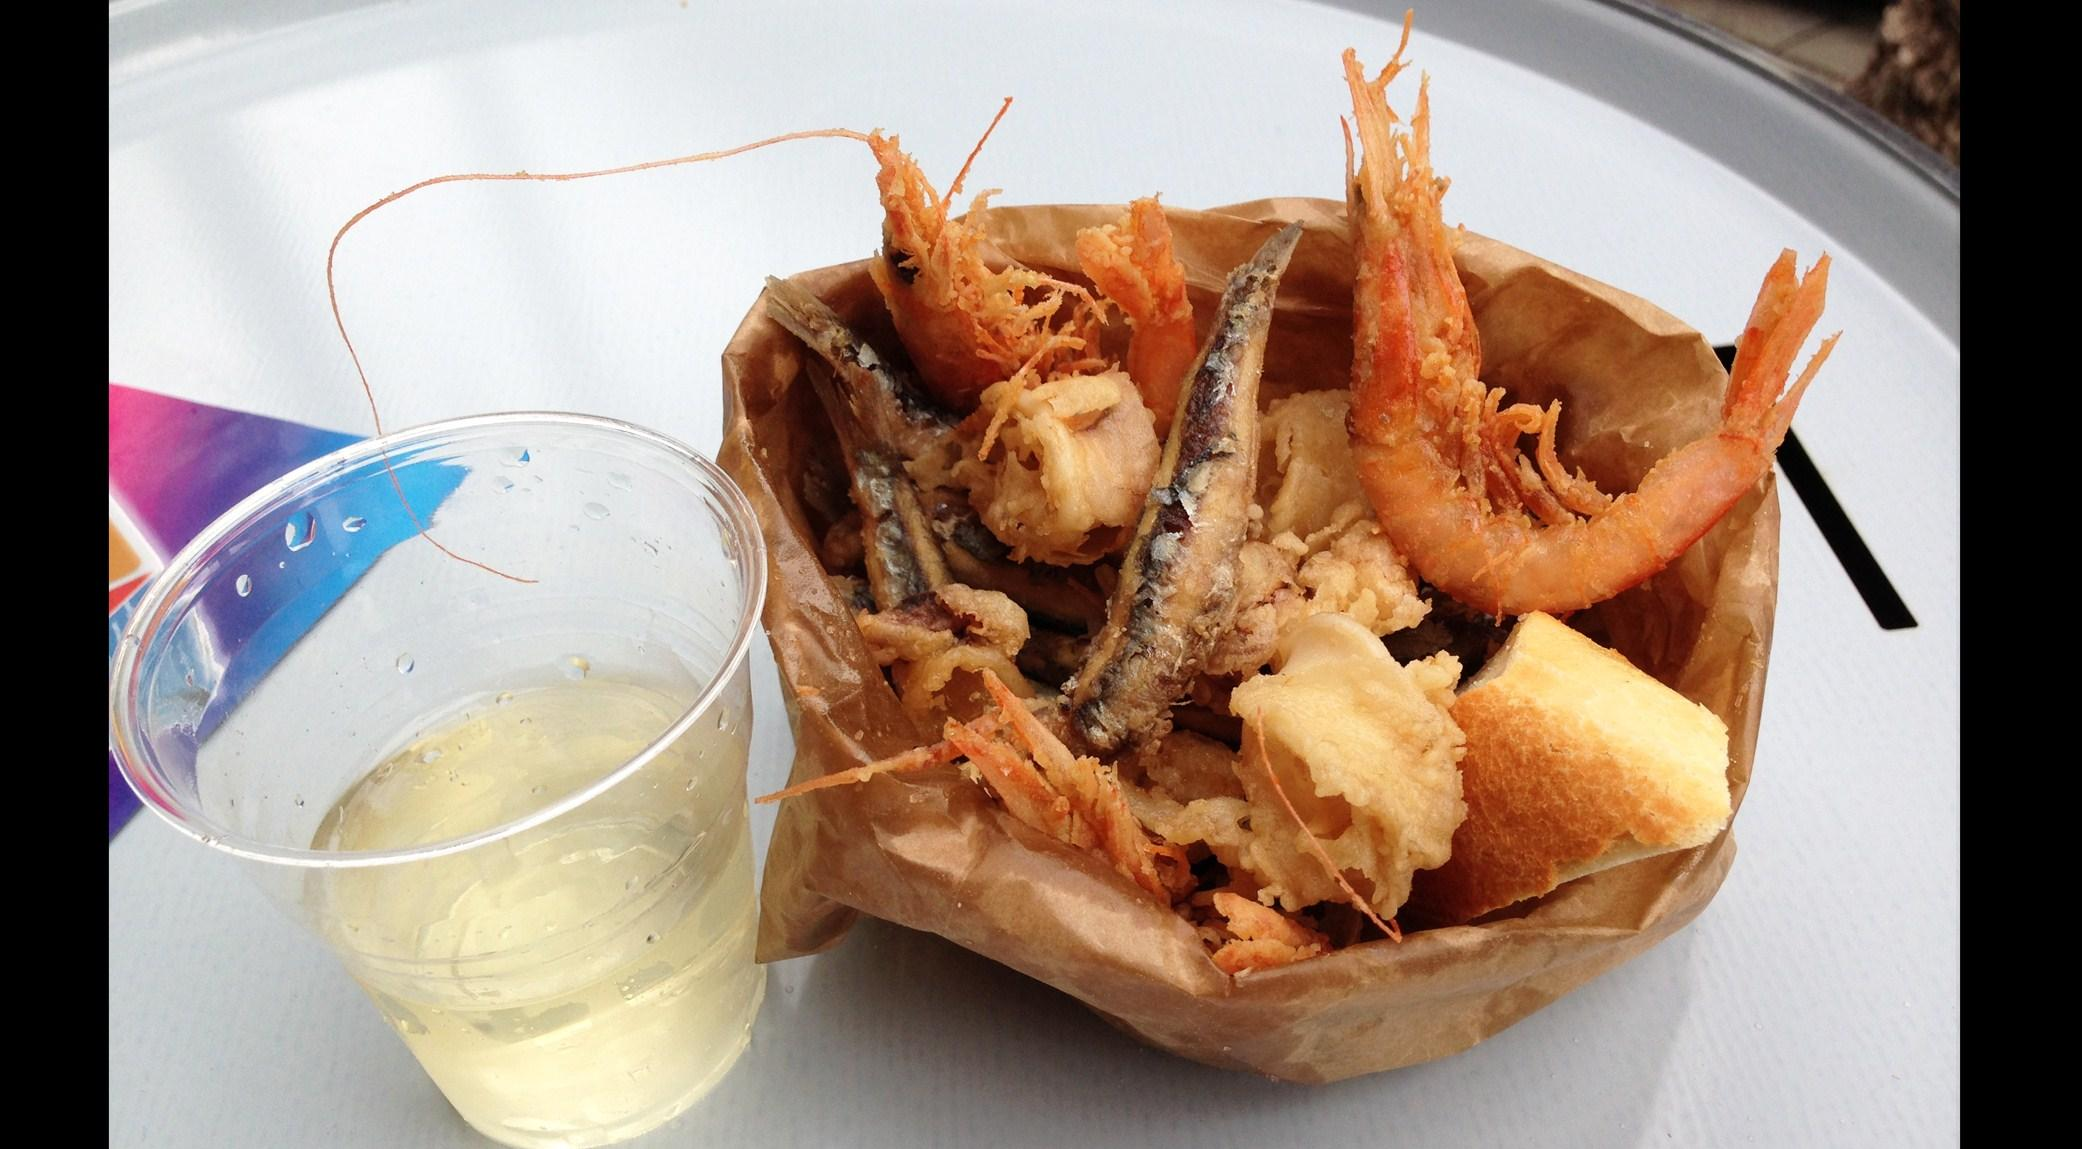 04-slow-fish-2013-frittura-pesce